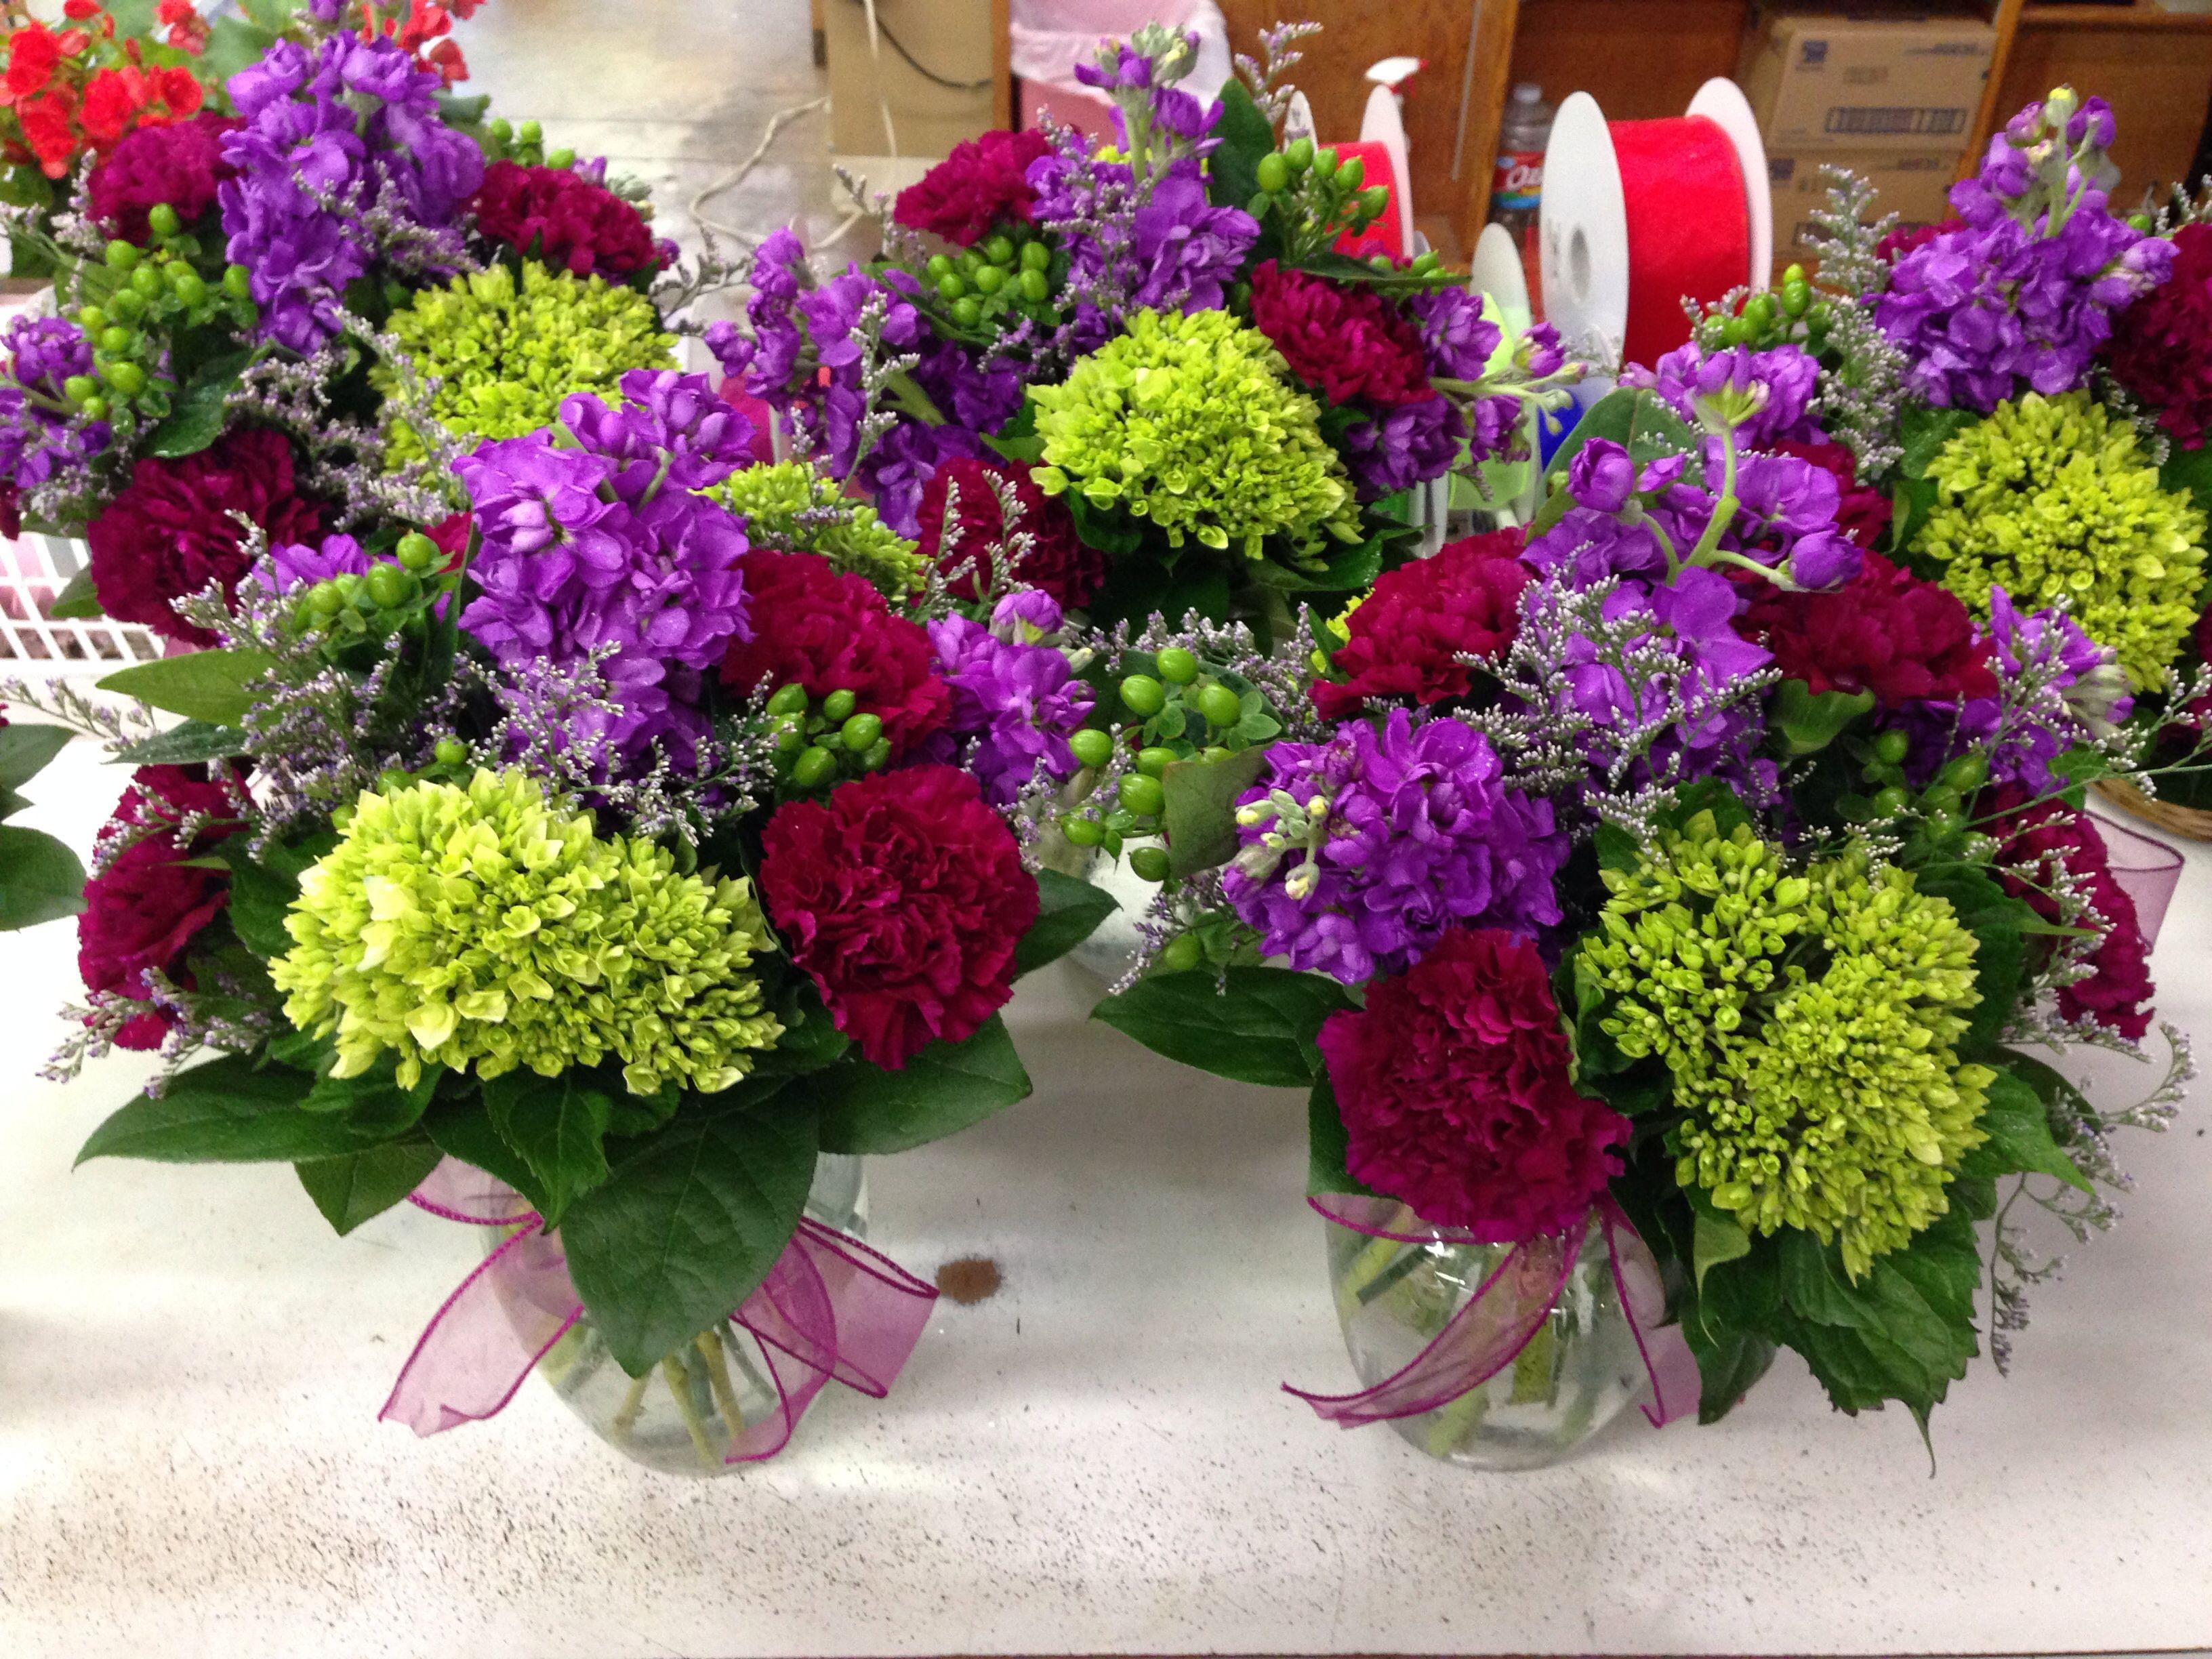 bouquet green hydrangea lavender stock blue delphinium wedding plum hydrangea hydrangea stock stock roses hydrangeas centerpiece jewel centerpieces flowers memphis tone green purple plum